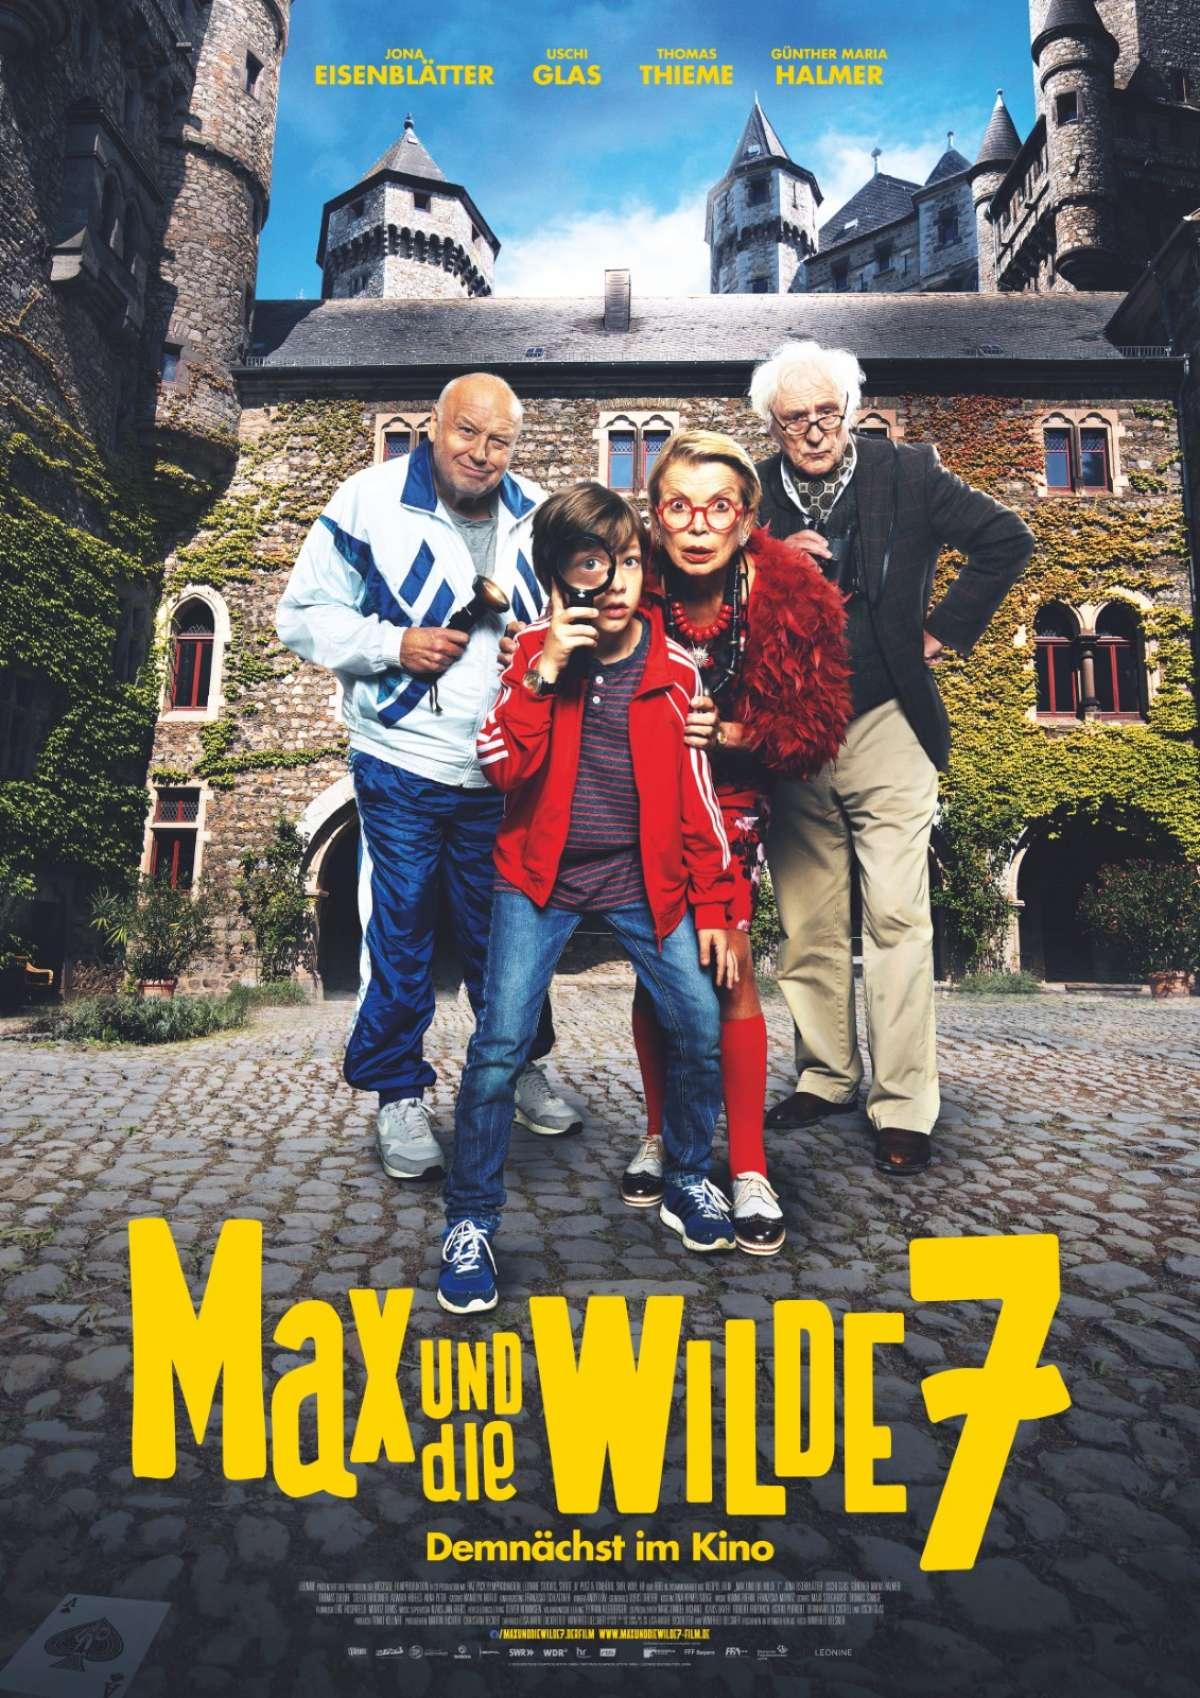 Max und die Wilde 7 - CineK-Kino  - Korbach